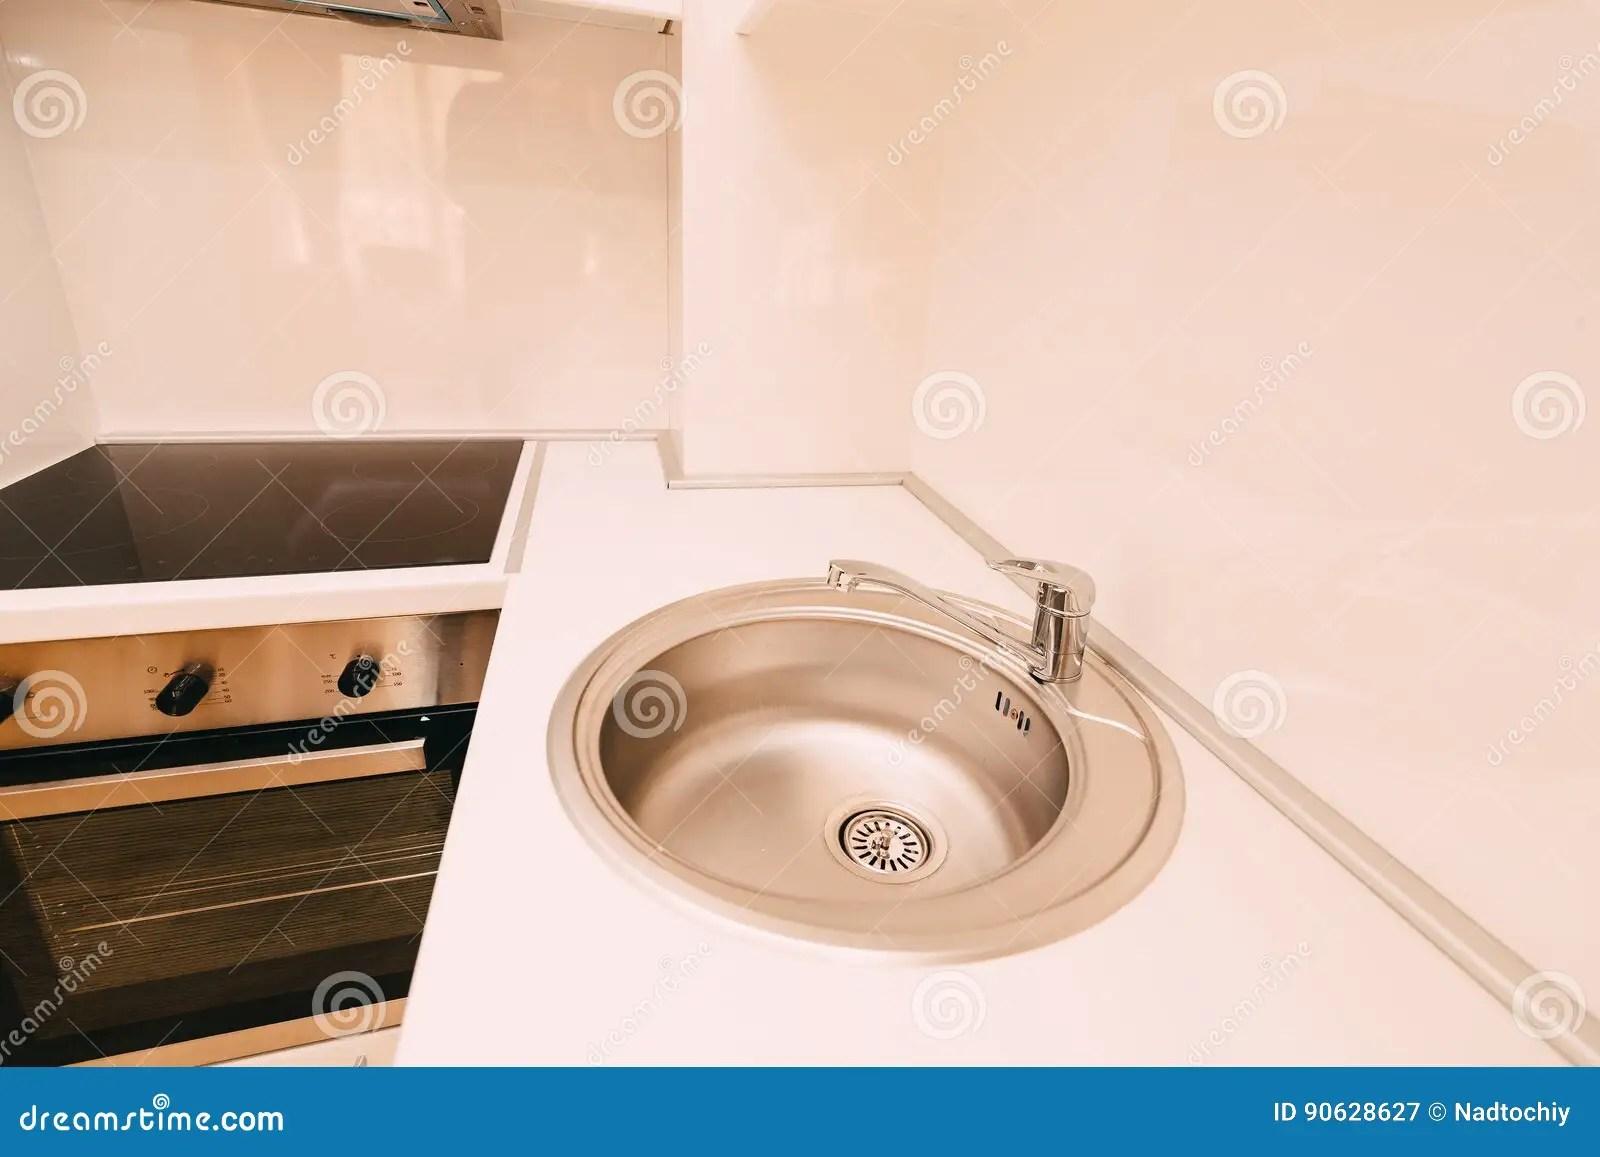 27 kitchen sink design stores near me 剪报文件包括厨房路径水槽自来水在厨房里kitc的内部库存图片 图片包括有 剪报文件包括厨房路径水槽自来水在厨房里kitc的内部